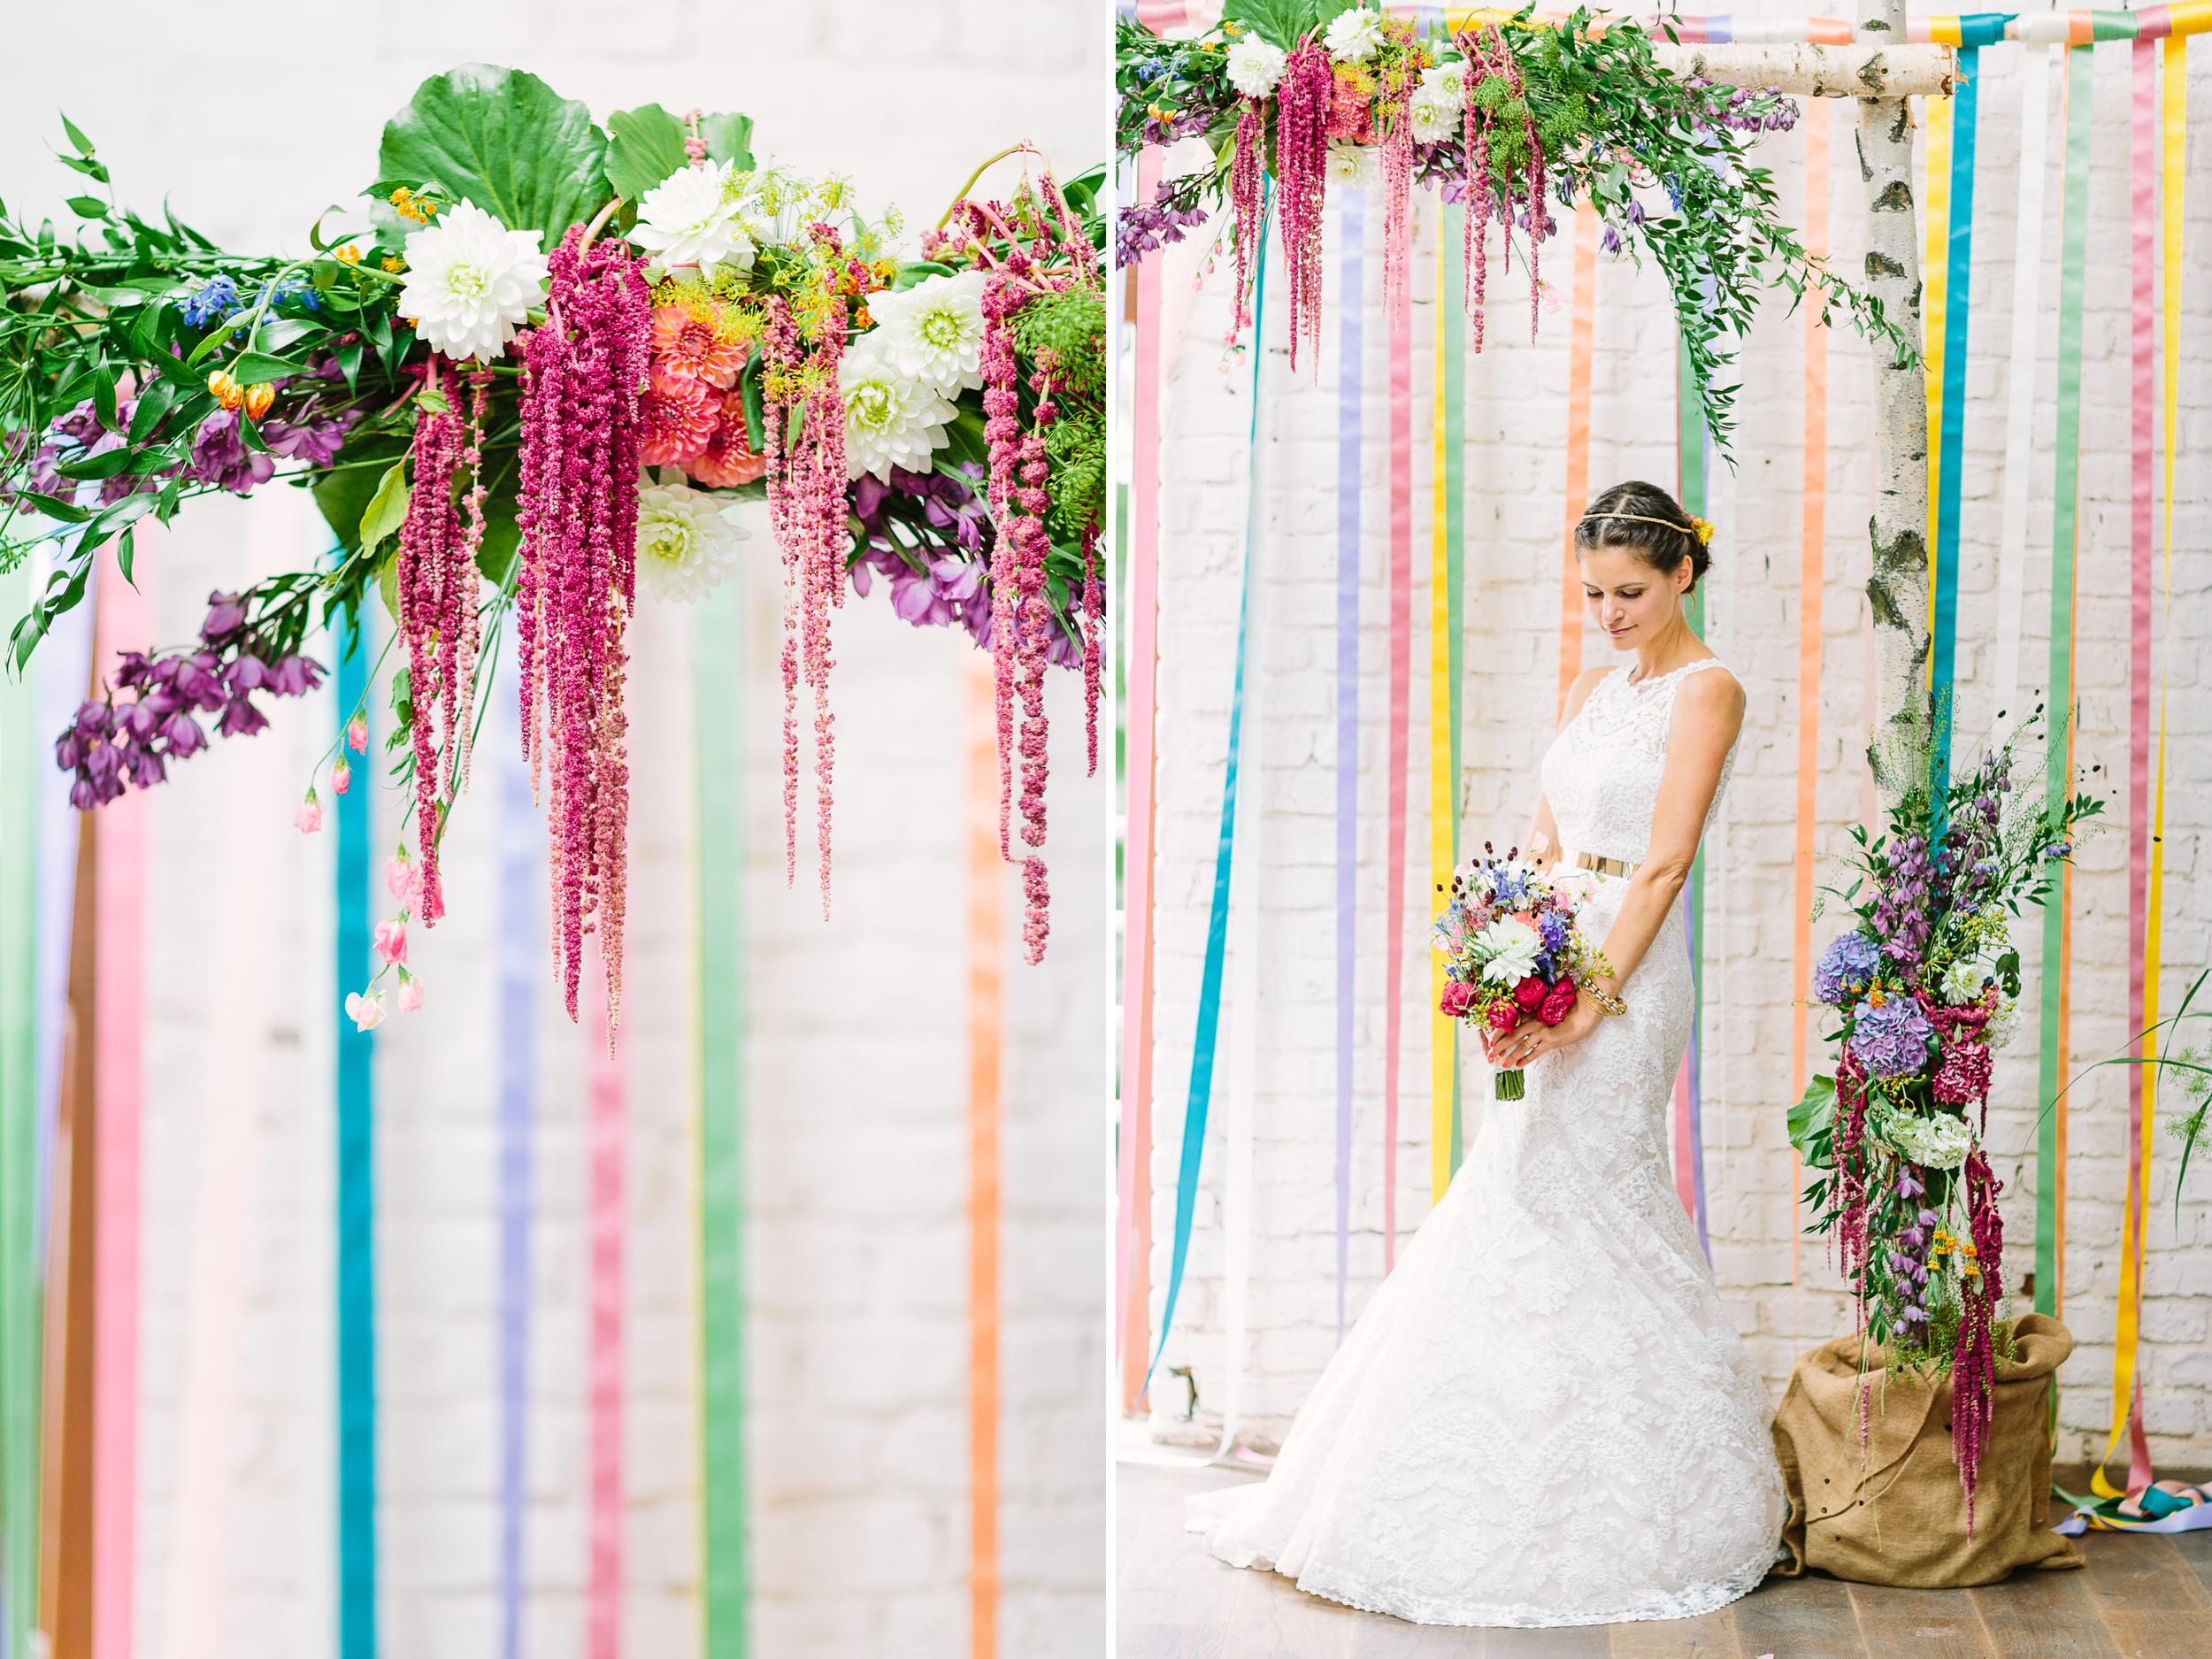 Hochzeitsfotograf LE HAI LINH Bohemien Braut.jpg